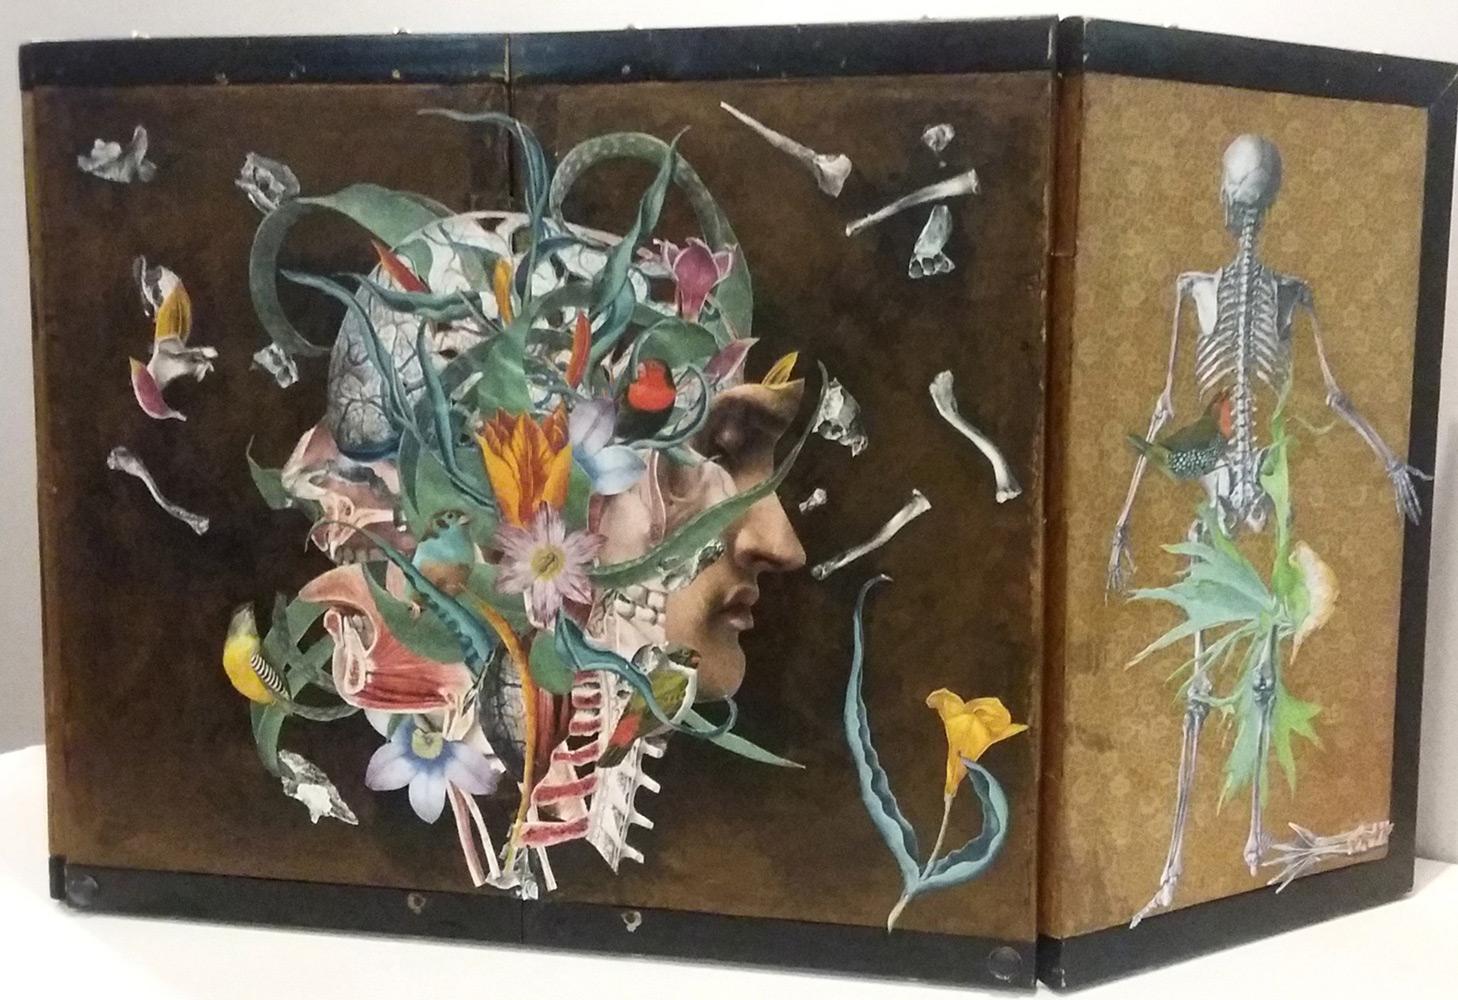 Axelle Kieffer   Ad Medietatem Corporis , analog collage on panel, 14.5 x 32.5 x 1 inches